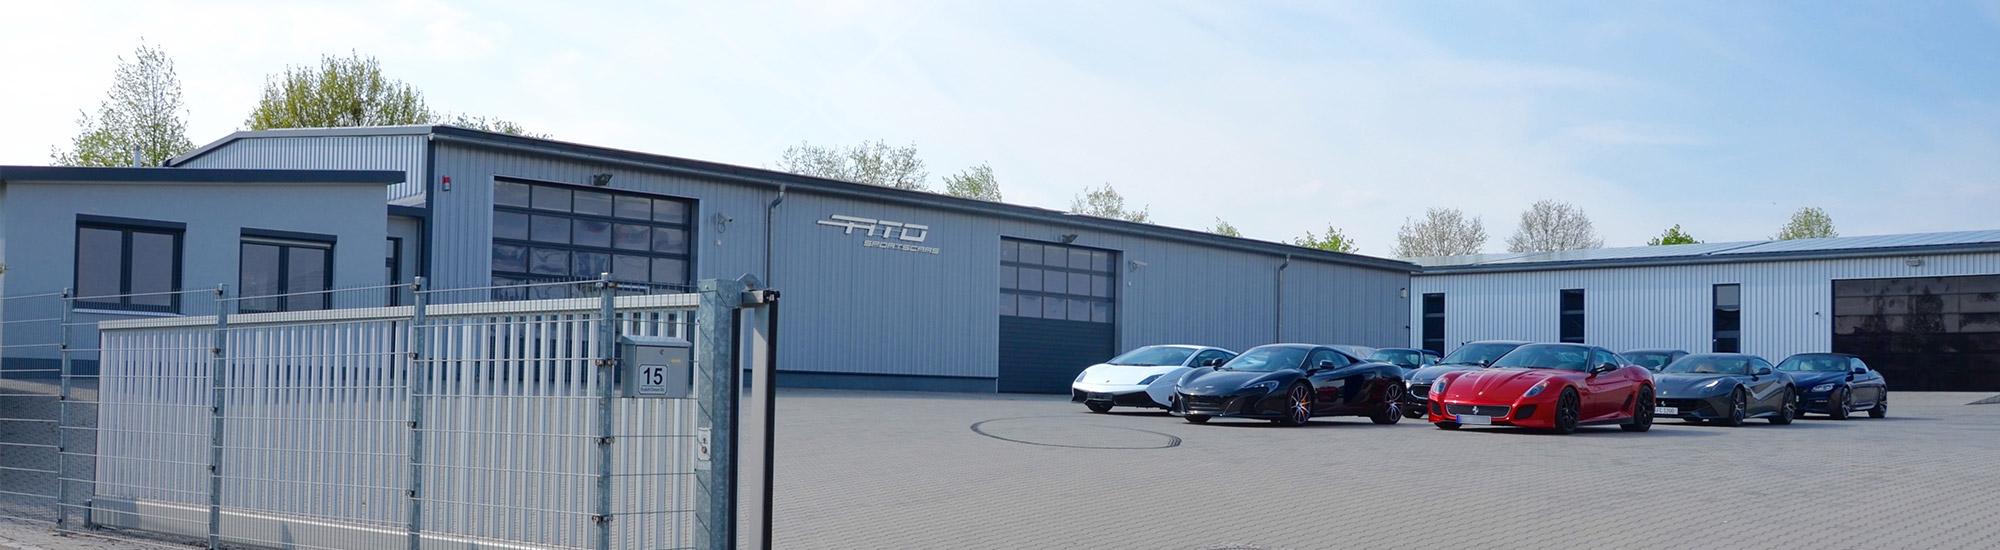 ATD-Sportscars Fuhrpark